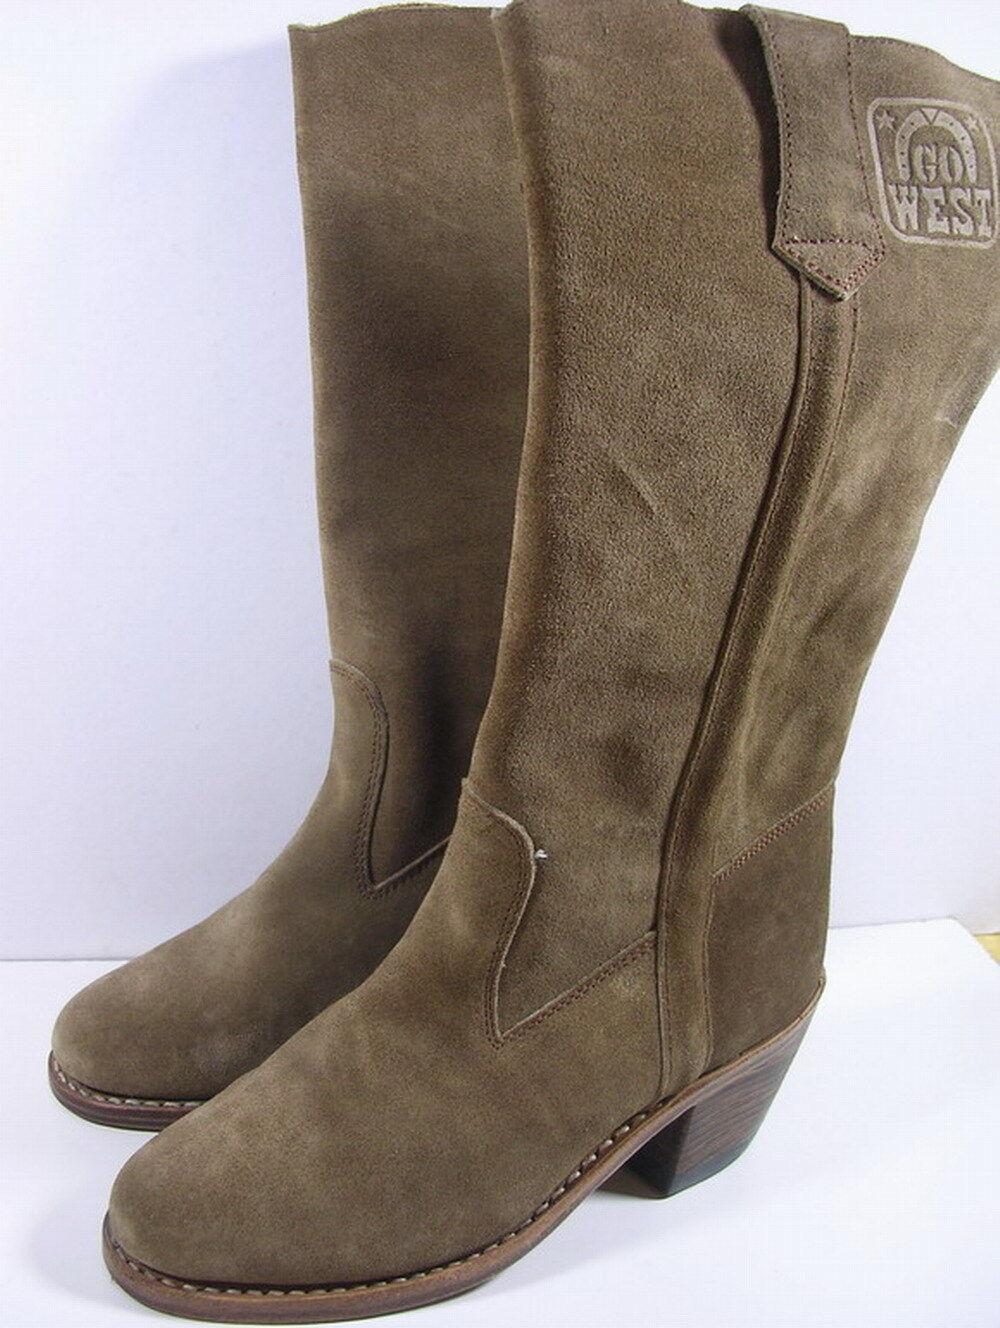 Grandes zapatos con descuento BOTTES GO WEST CUIR TAILLE 37 ANCIENNE VERS 1970/80